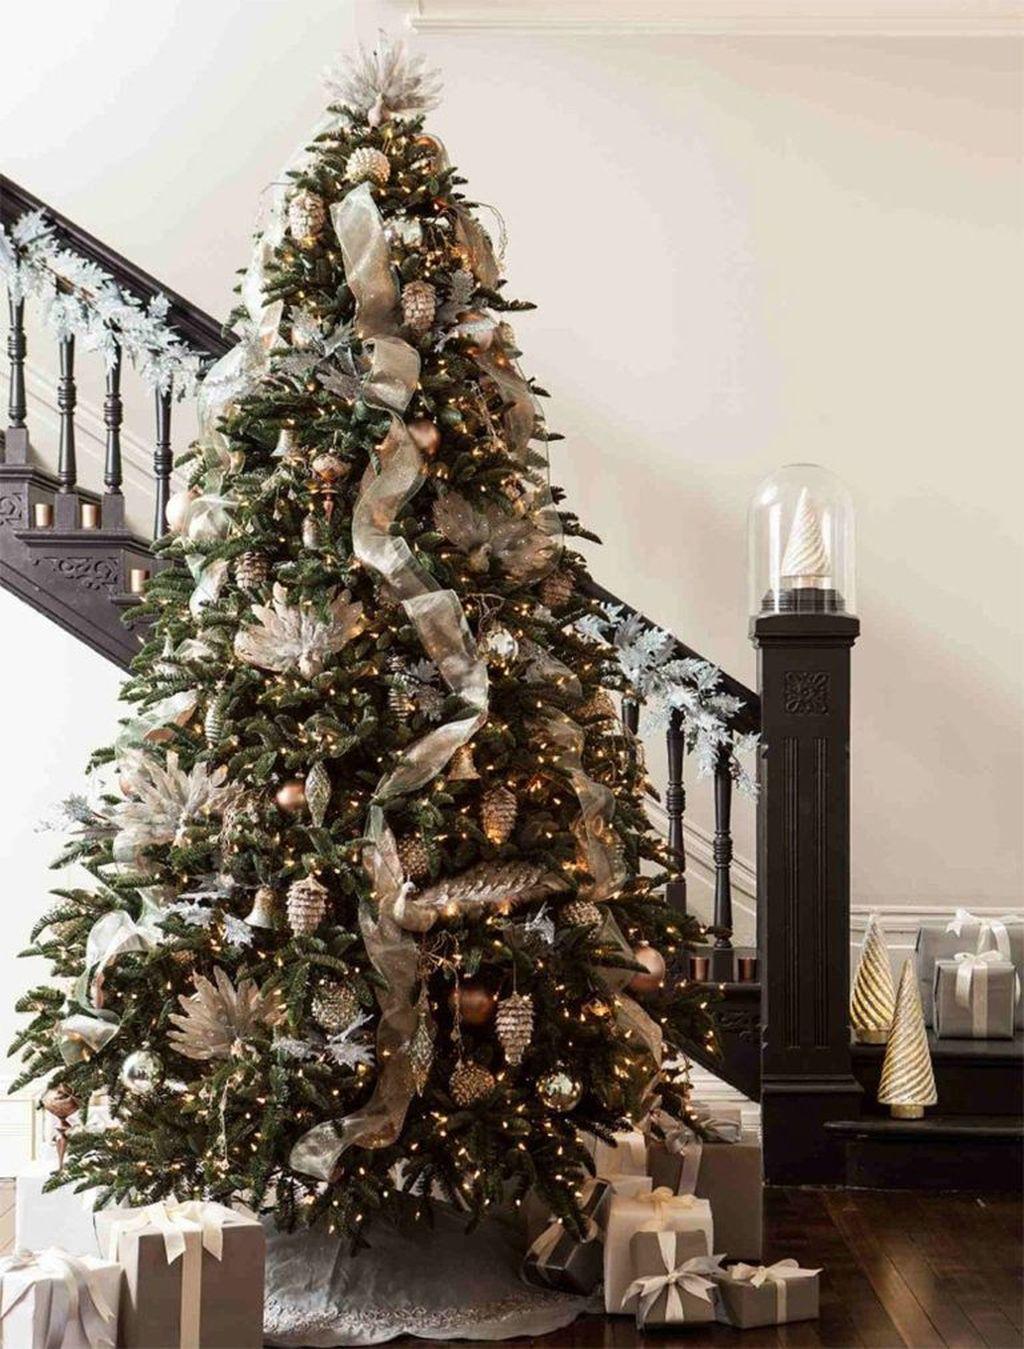 Amazing Winter Christmas Tree Design And Decor Ideas 20